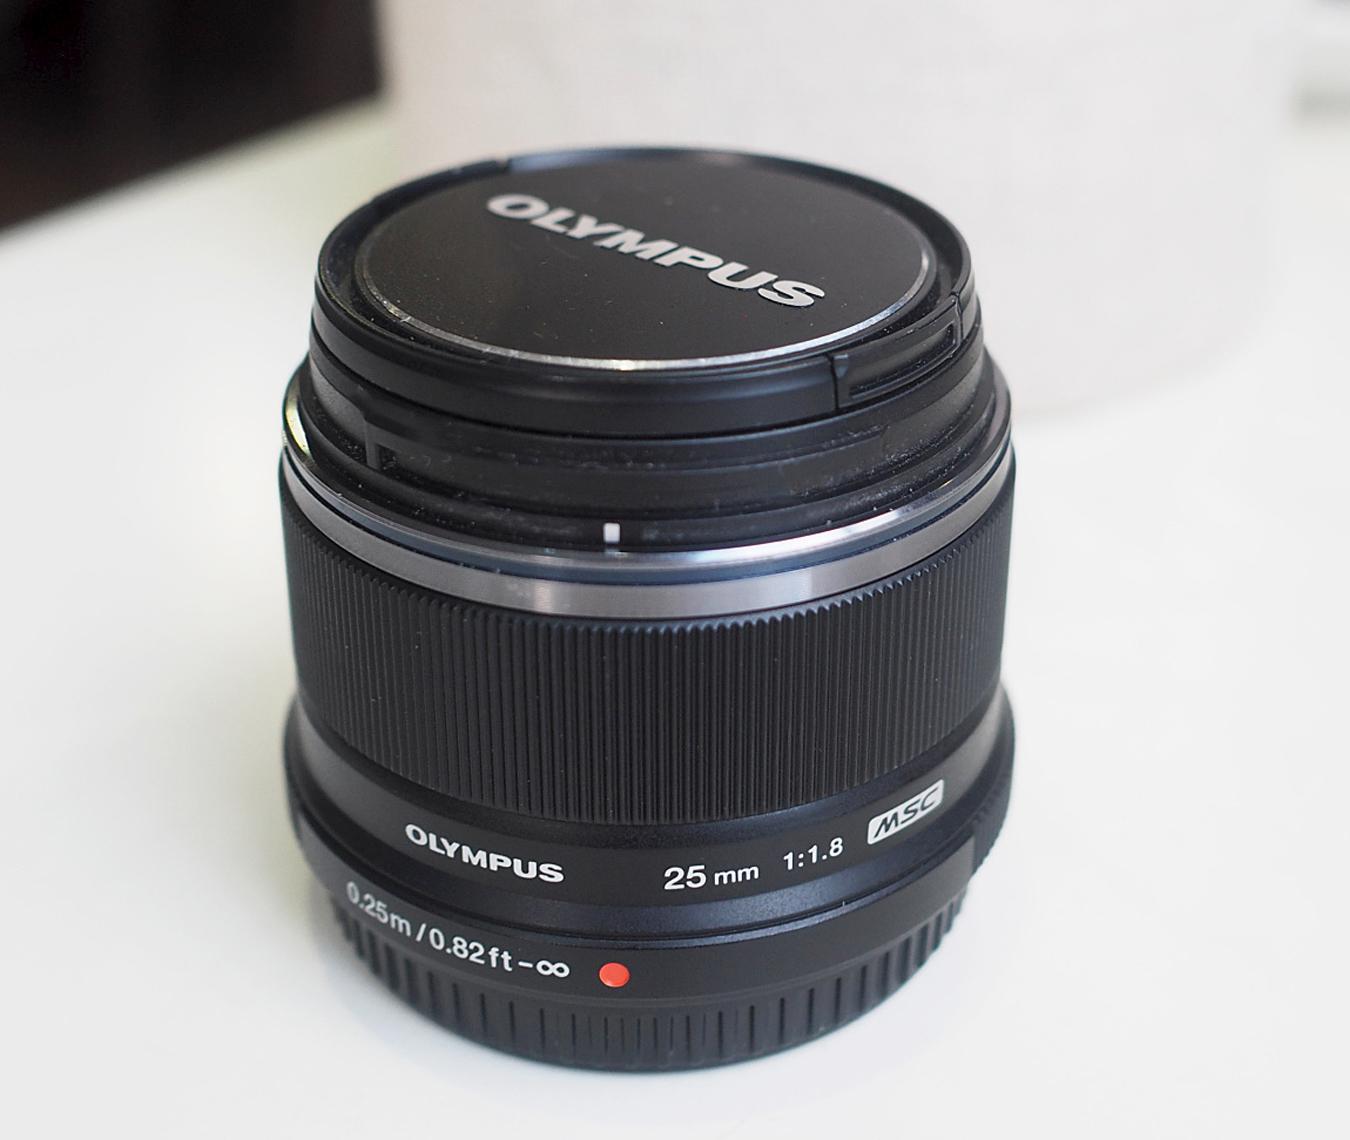 olympus pen camera lens